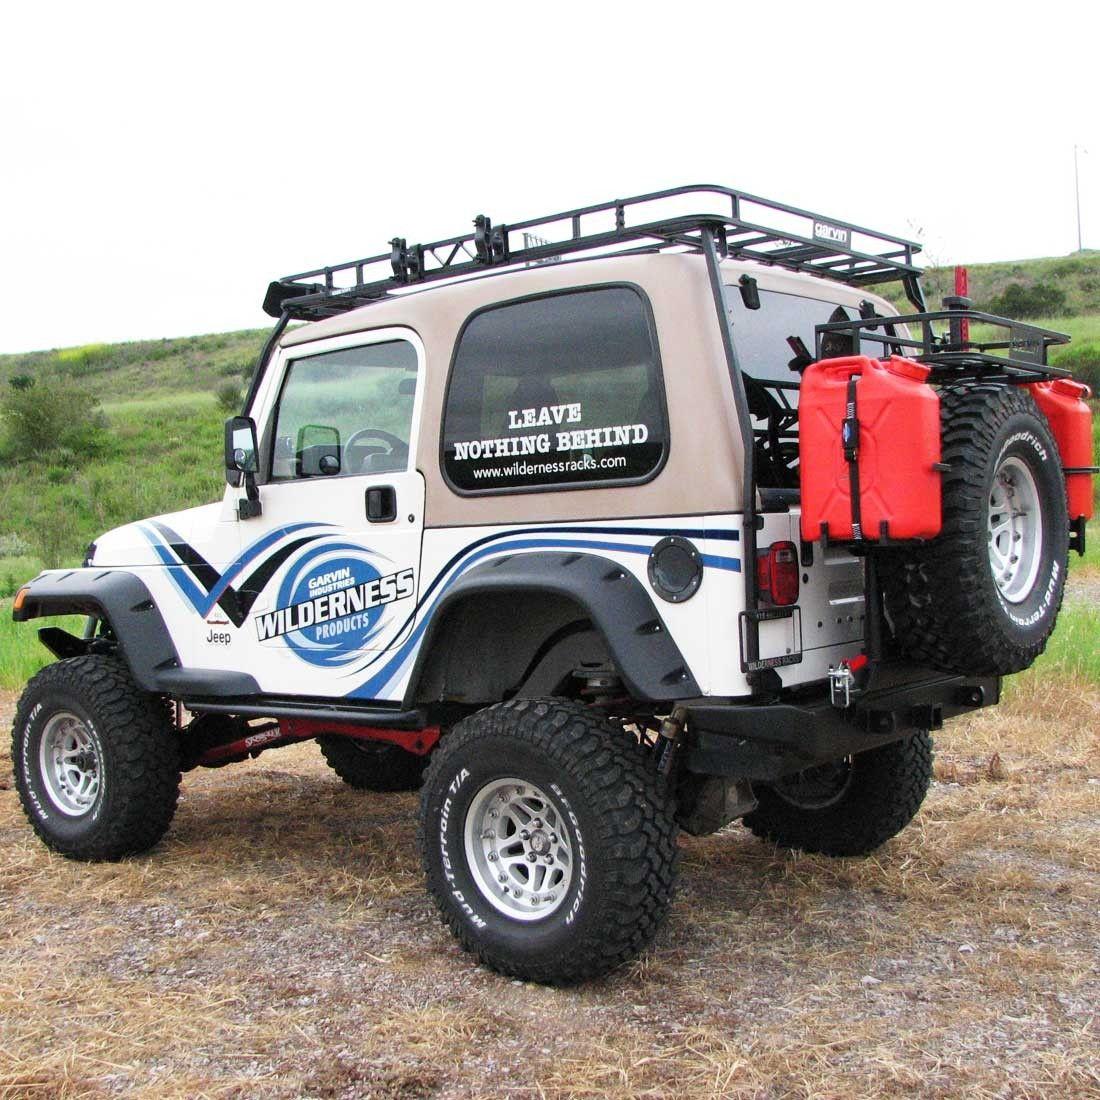 Expedition Rack Jeep 87 95 Yj Wrangler Jeep Wrangler Dream Cars Jeep Jeep Tj